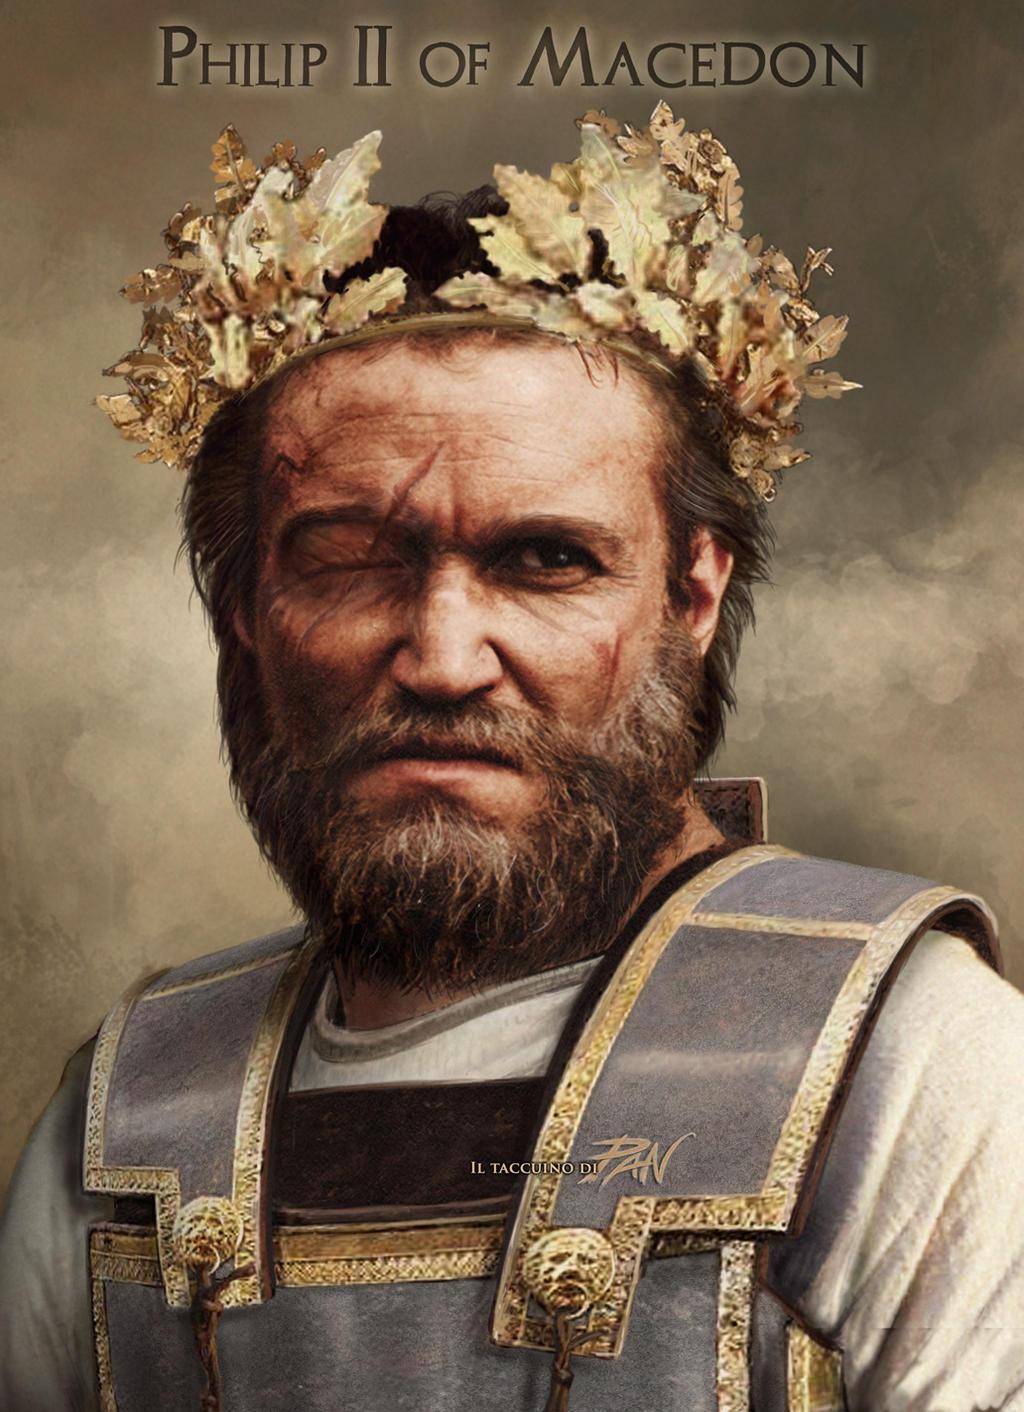 Philip II of Macedon by Panaiotis